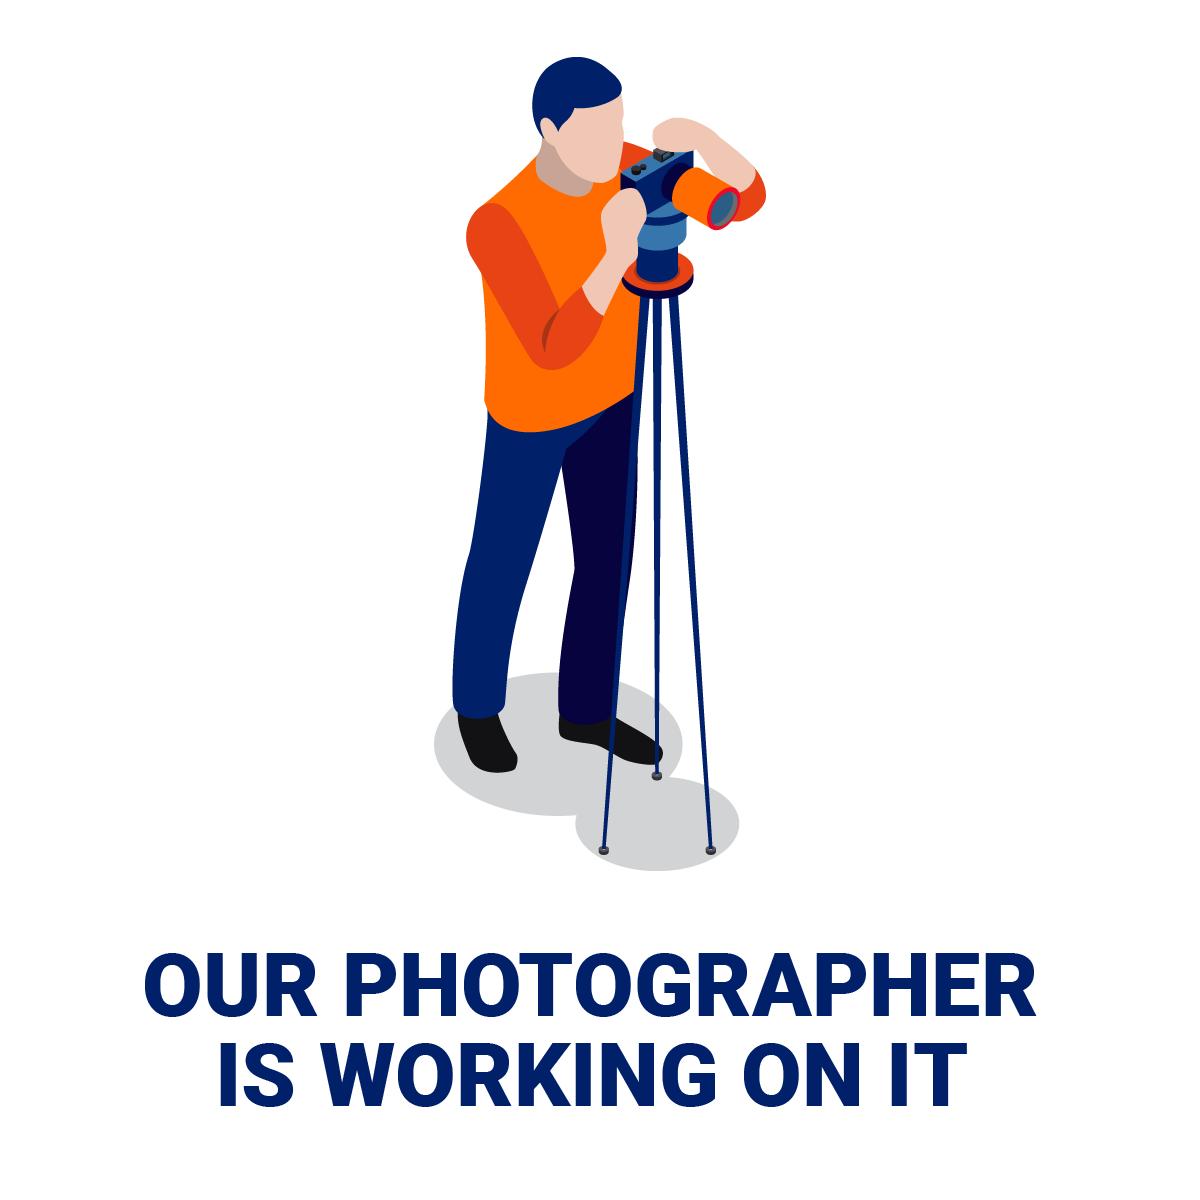 FHV0D R820 HEATSINK1